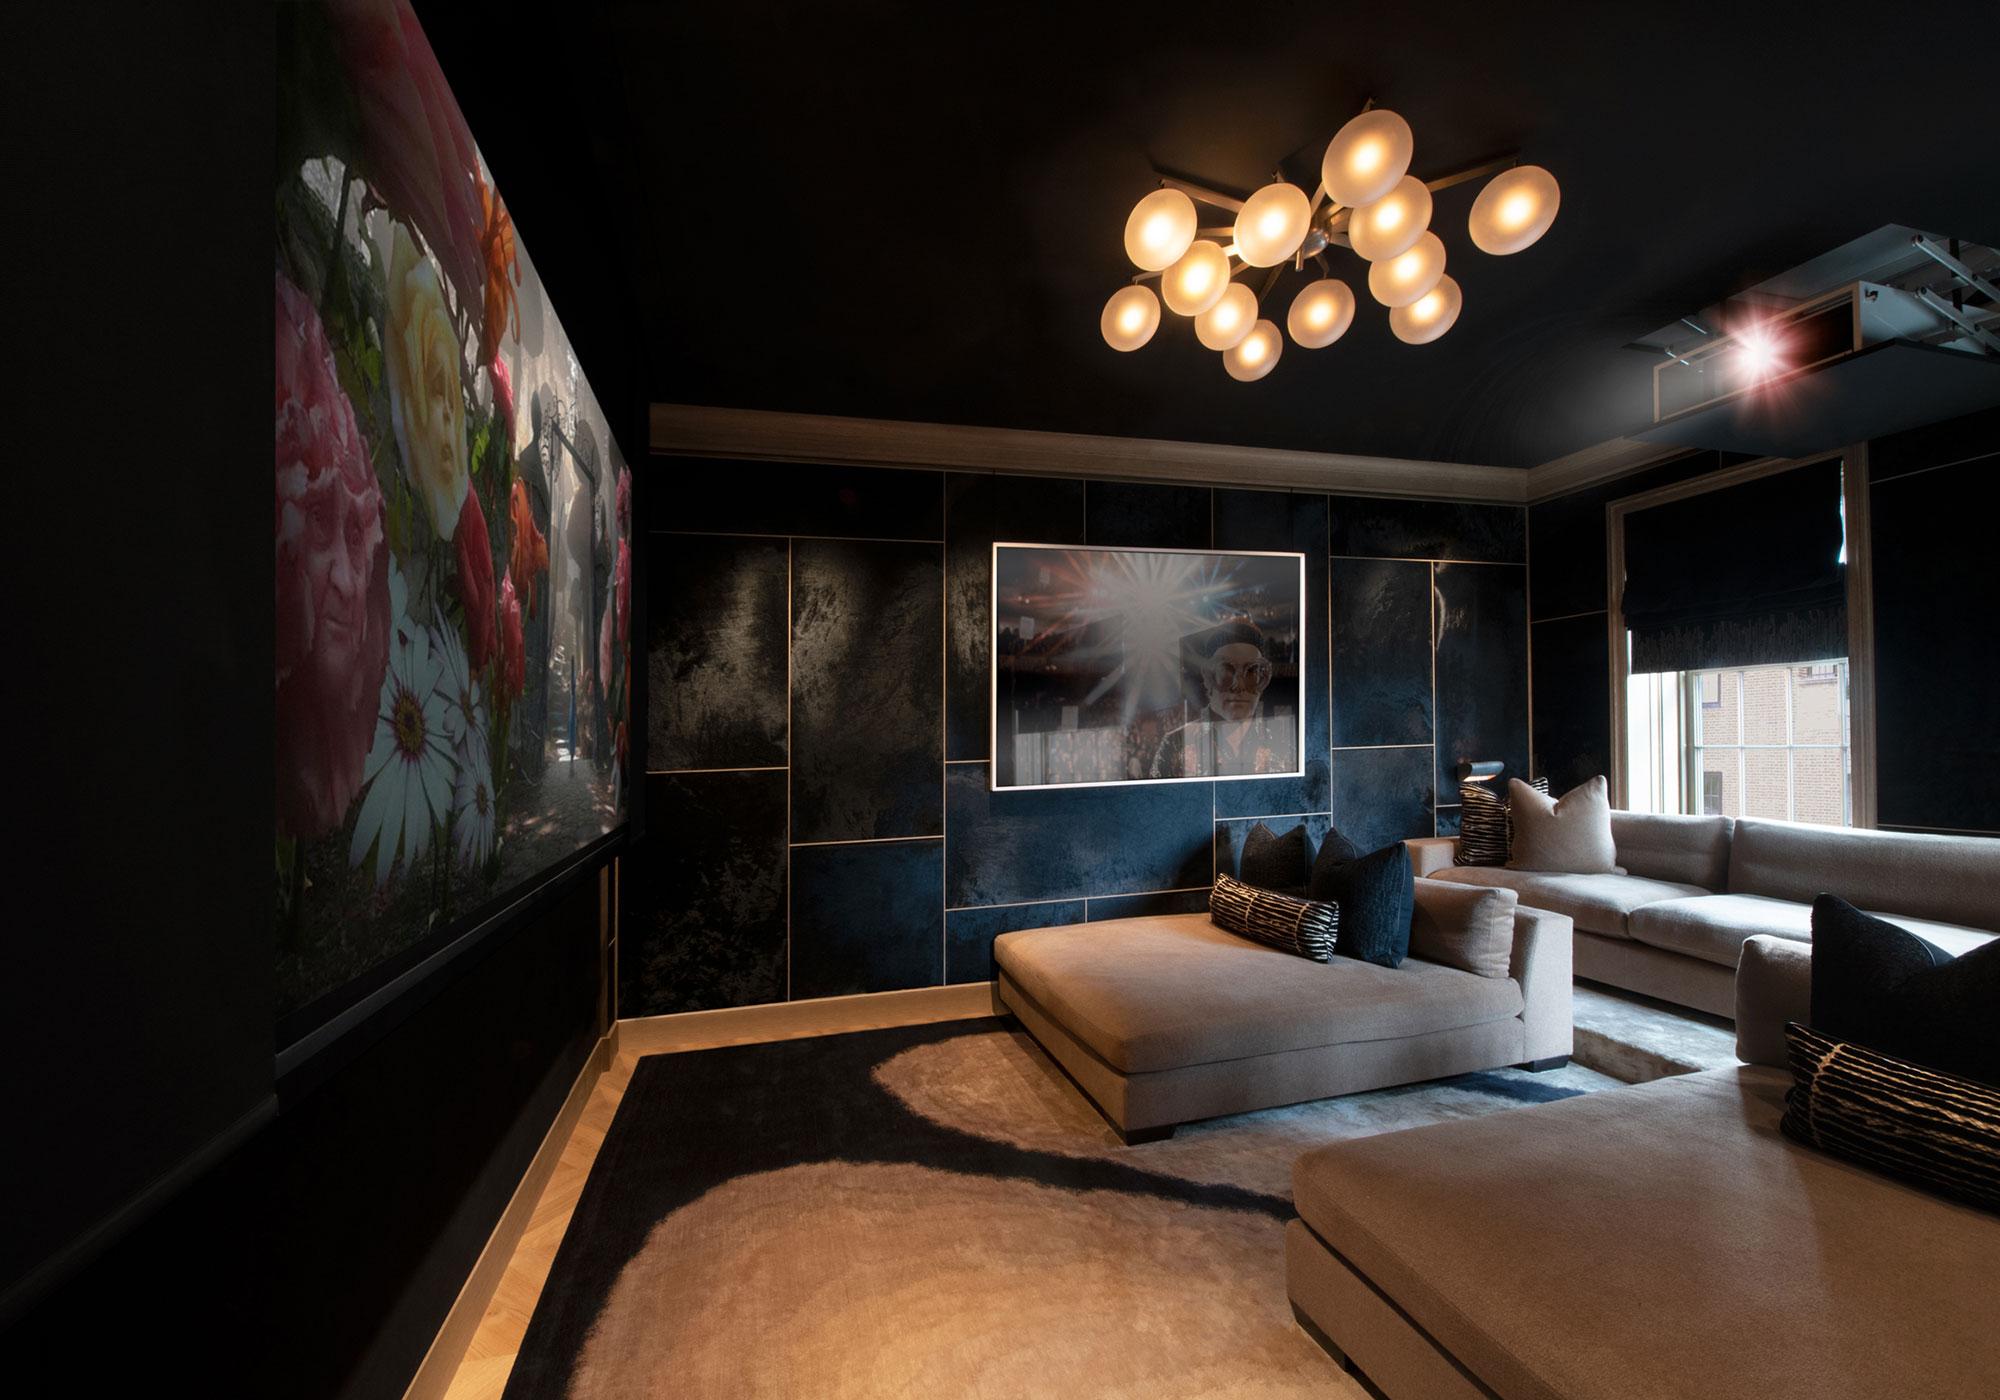 media room, tv, shades, blackout shades